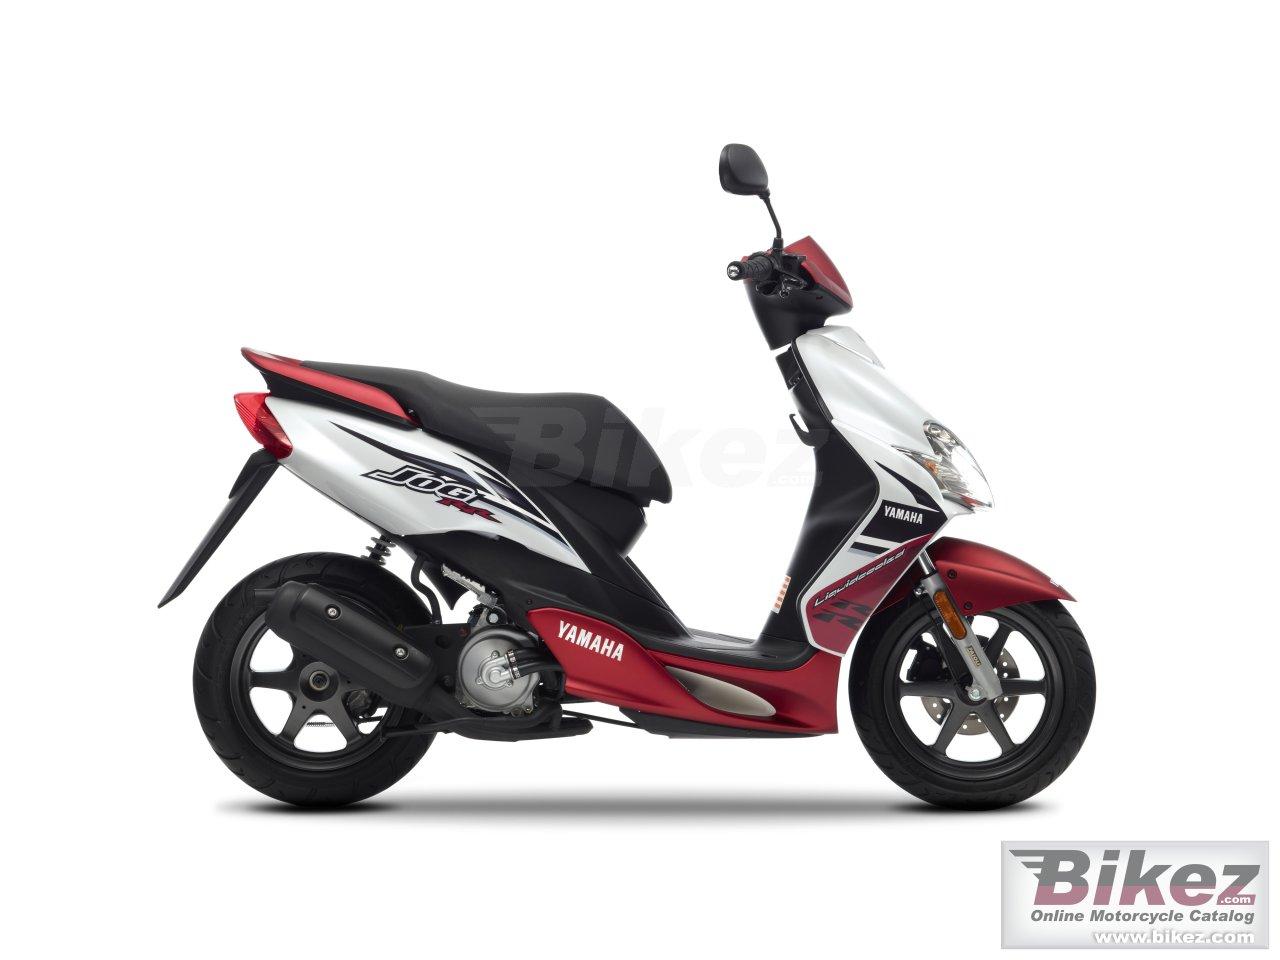 Yamaha jog r 2009 #3 - size 800